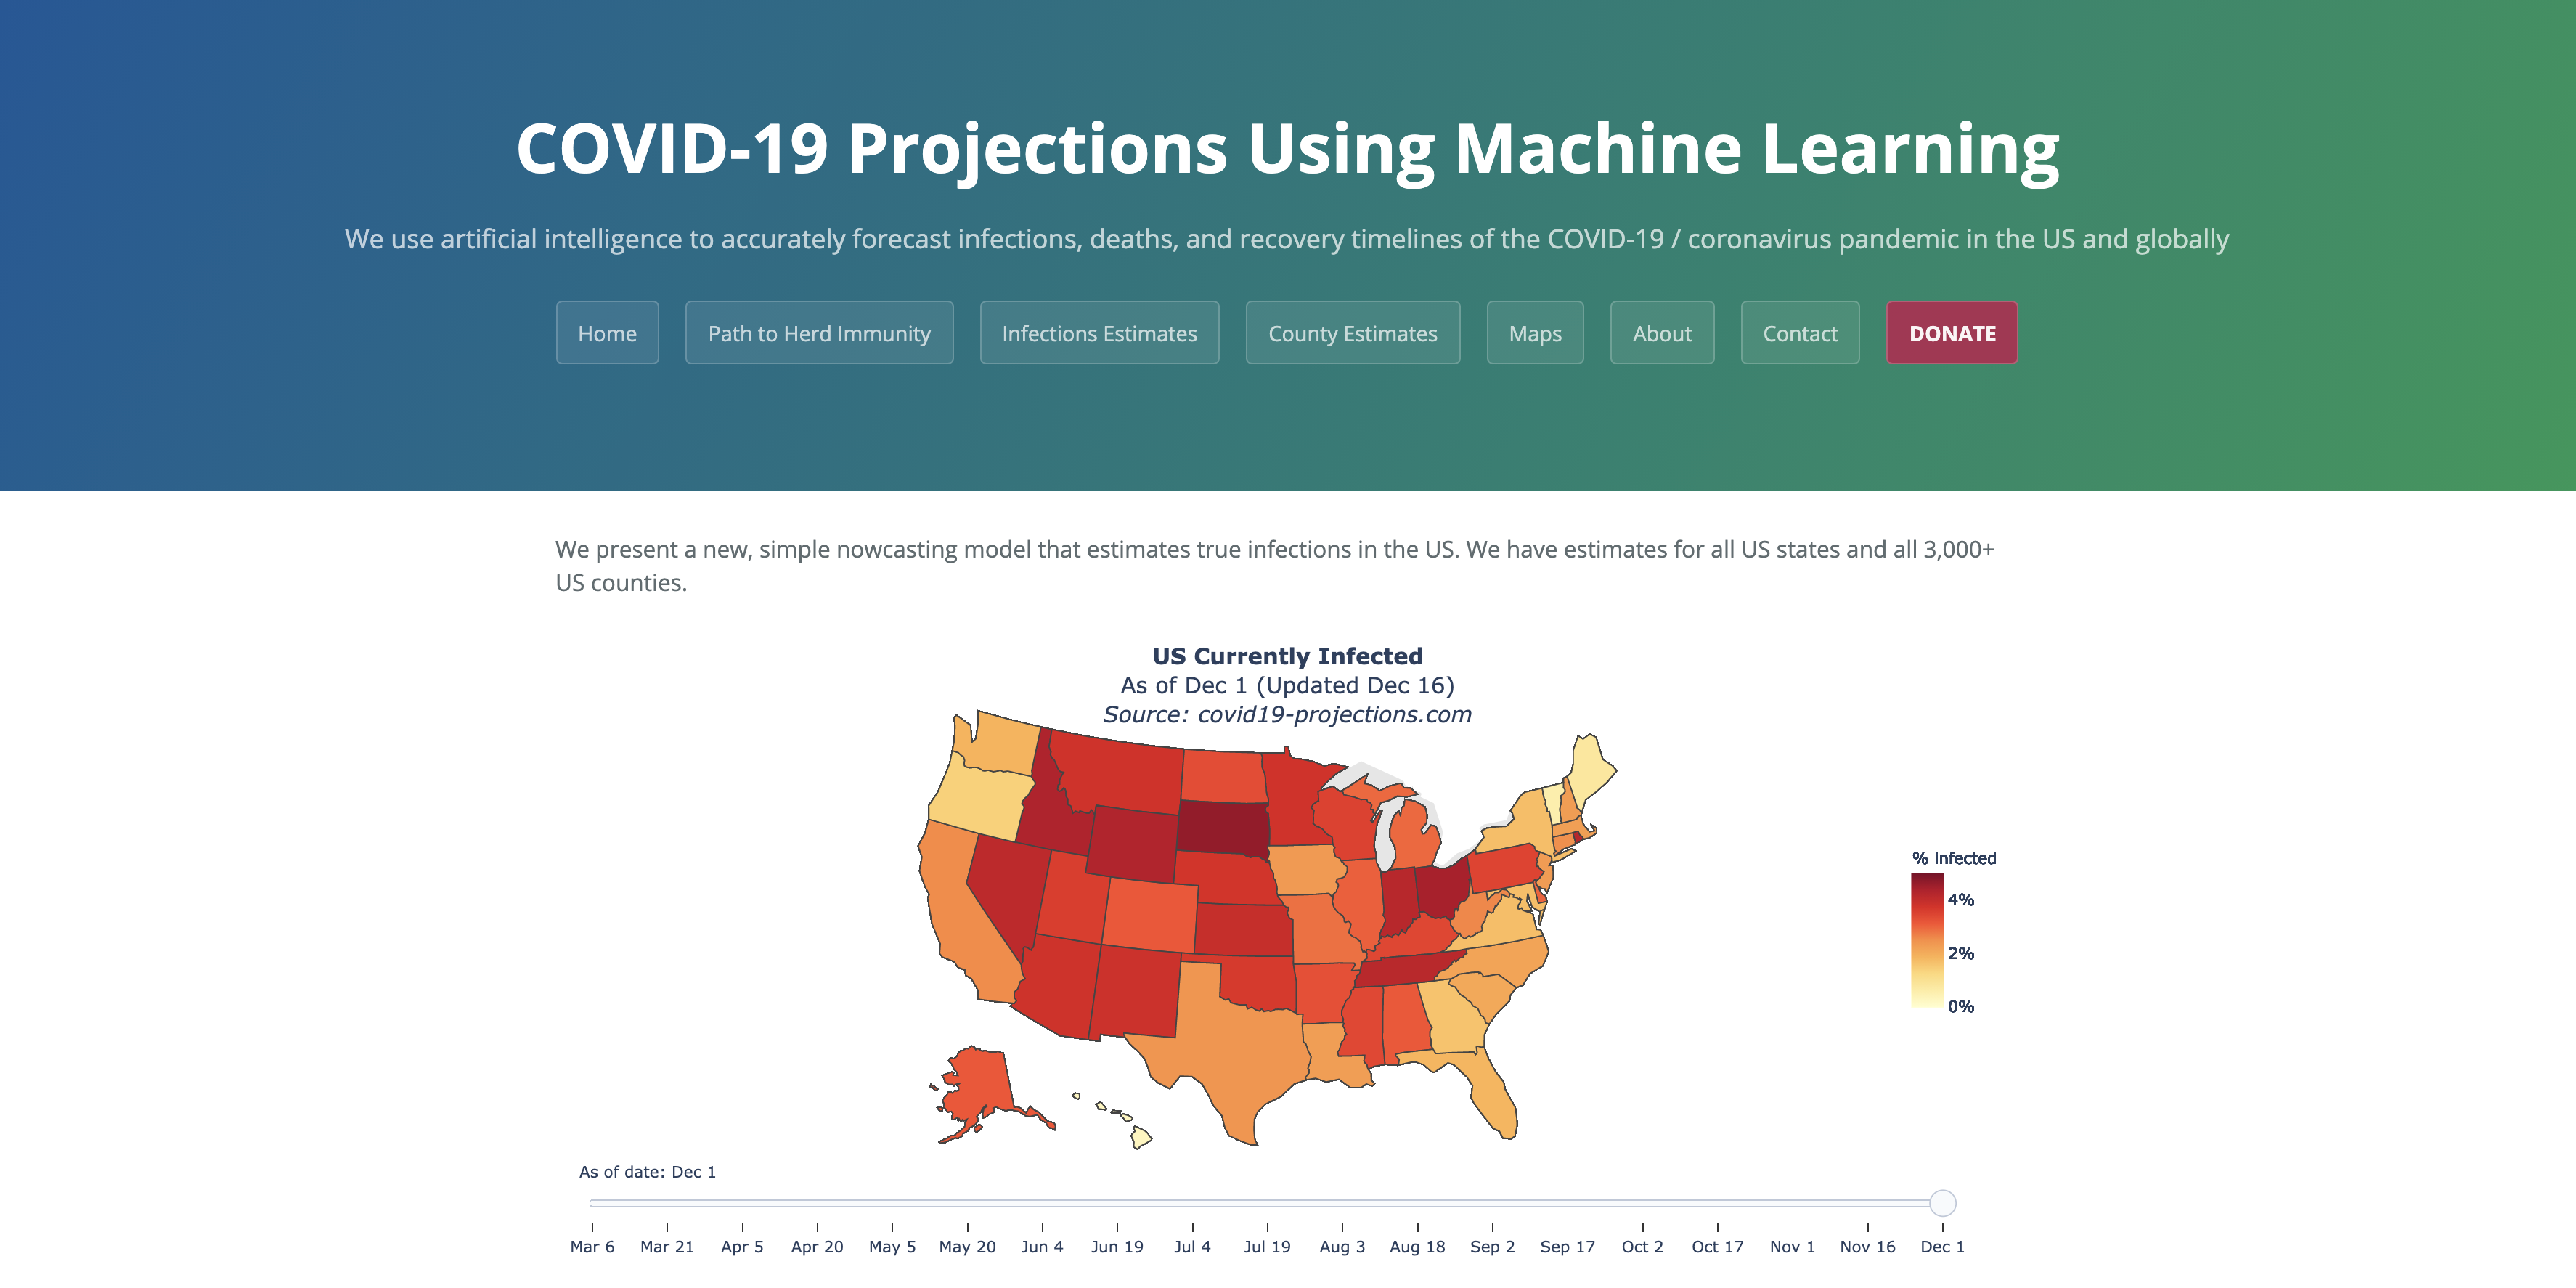 covid19-projections.com